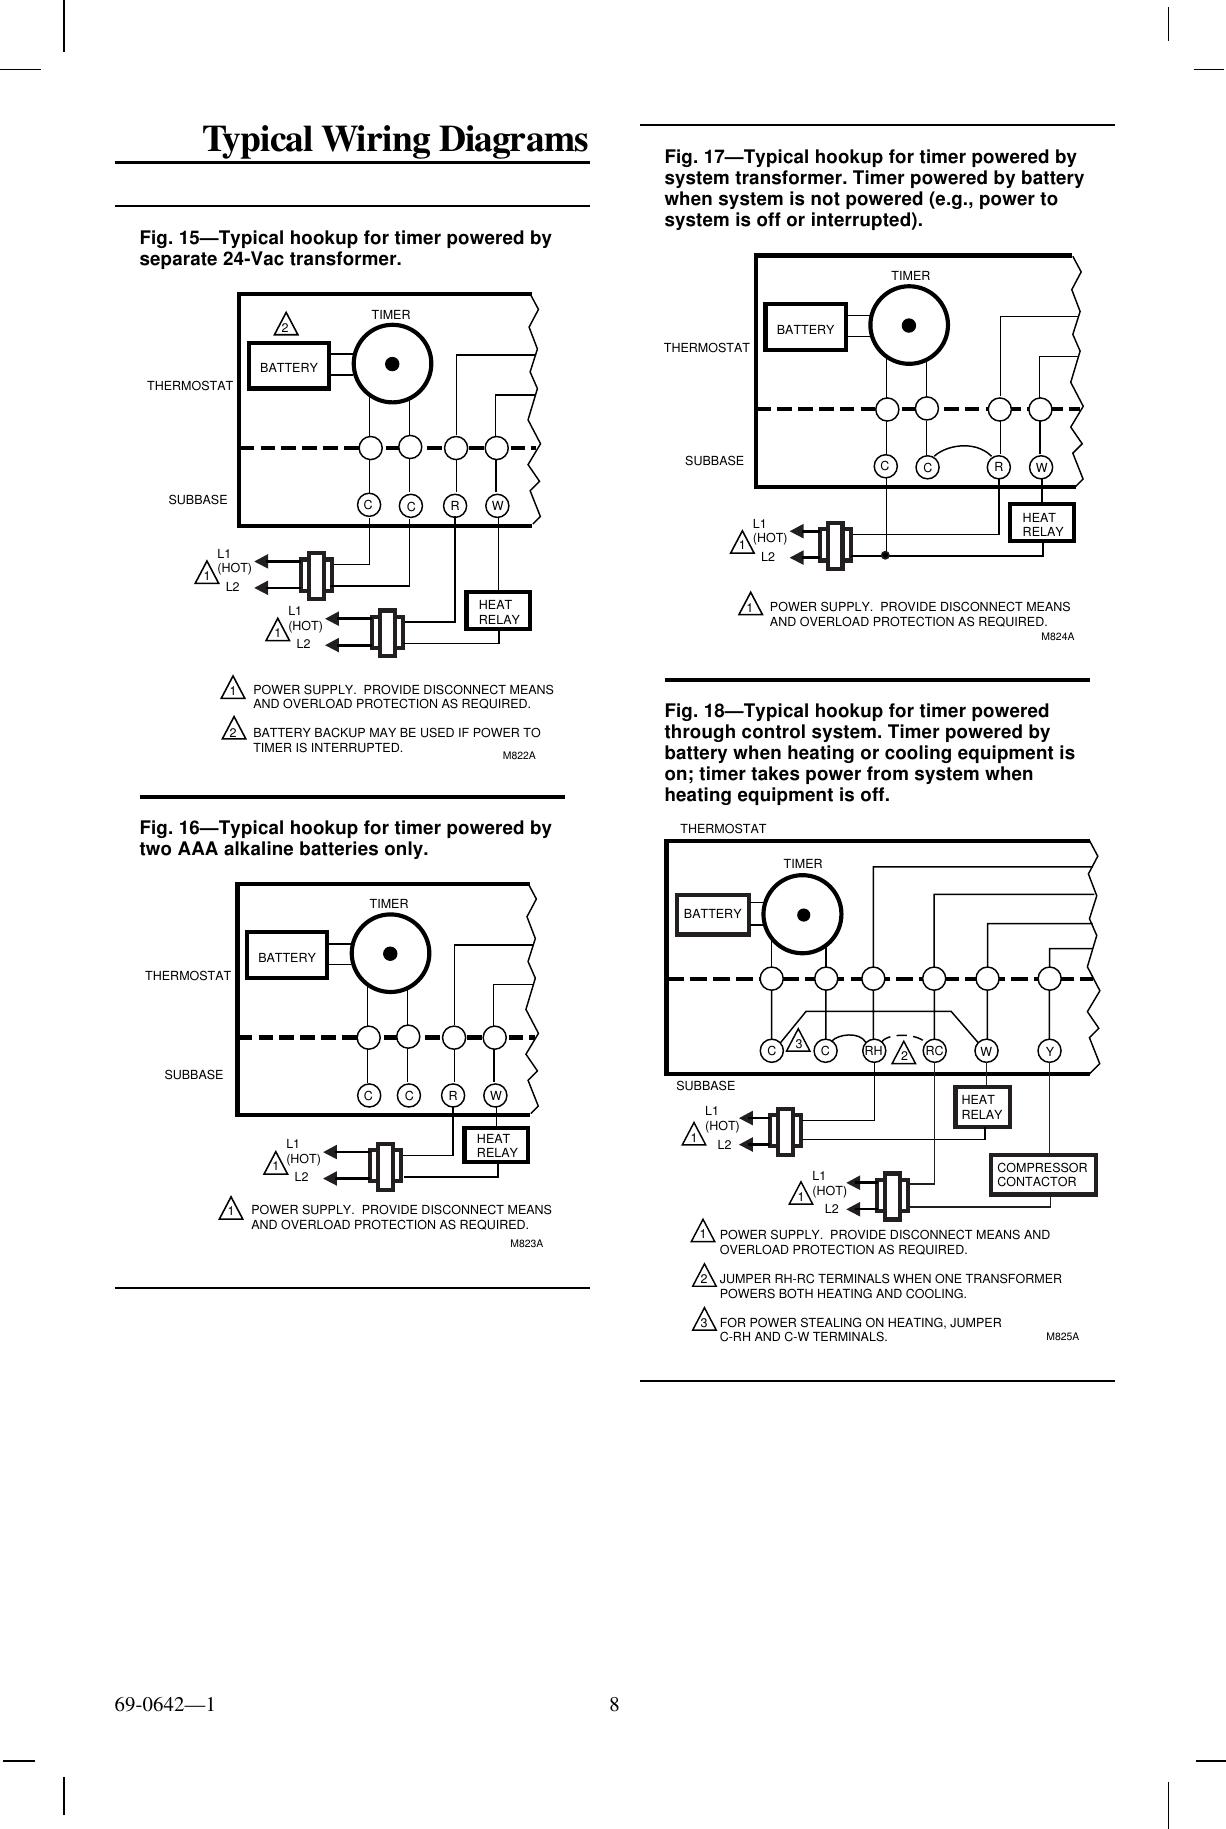 Honeywell R8239a1052 Wiring Diagram Honeywell Zone Valve